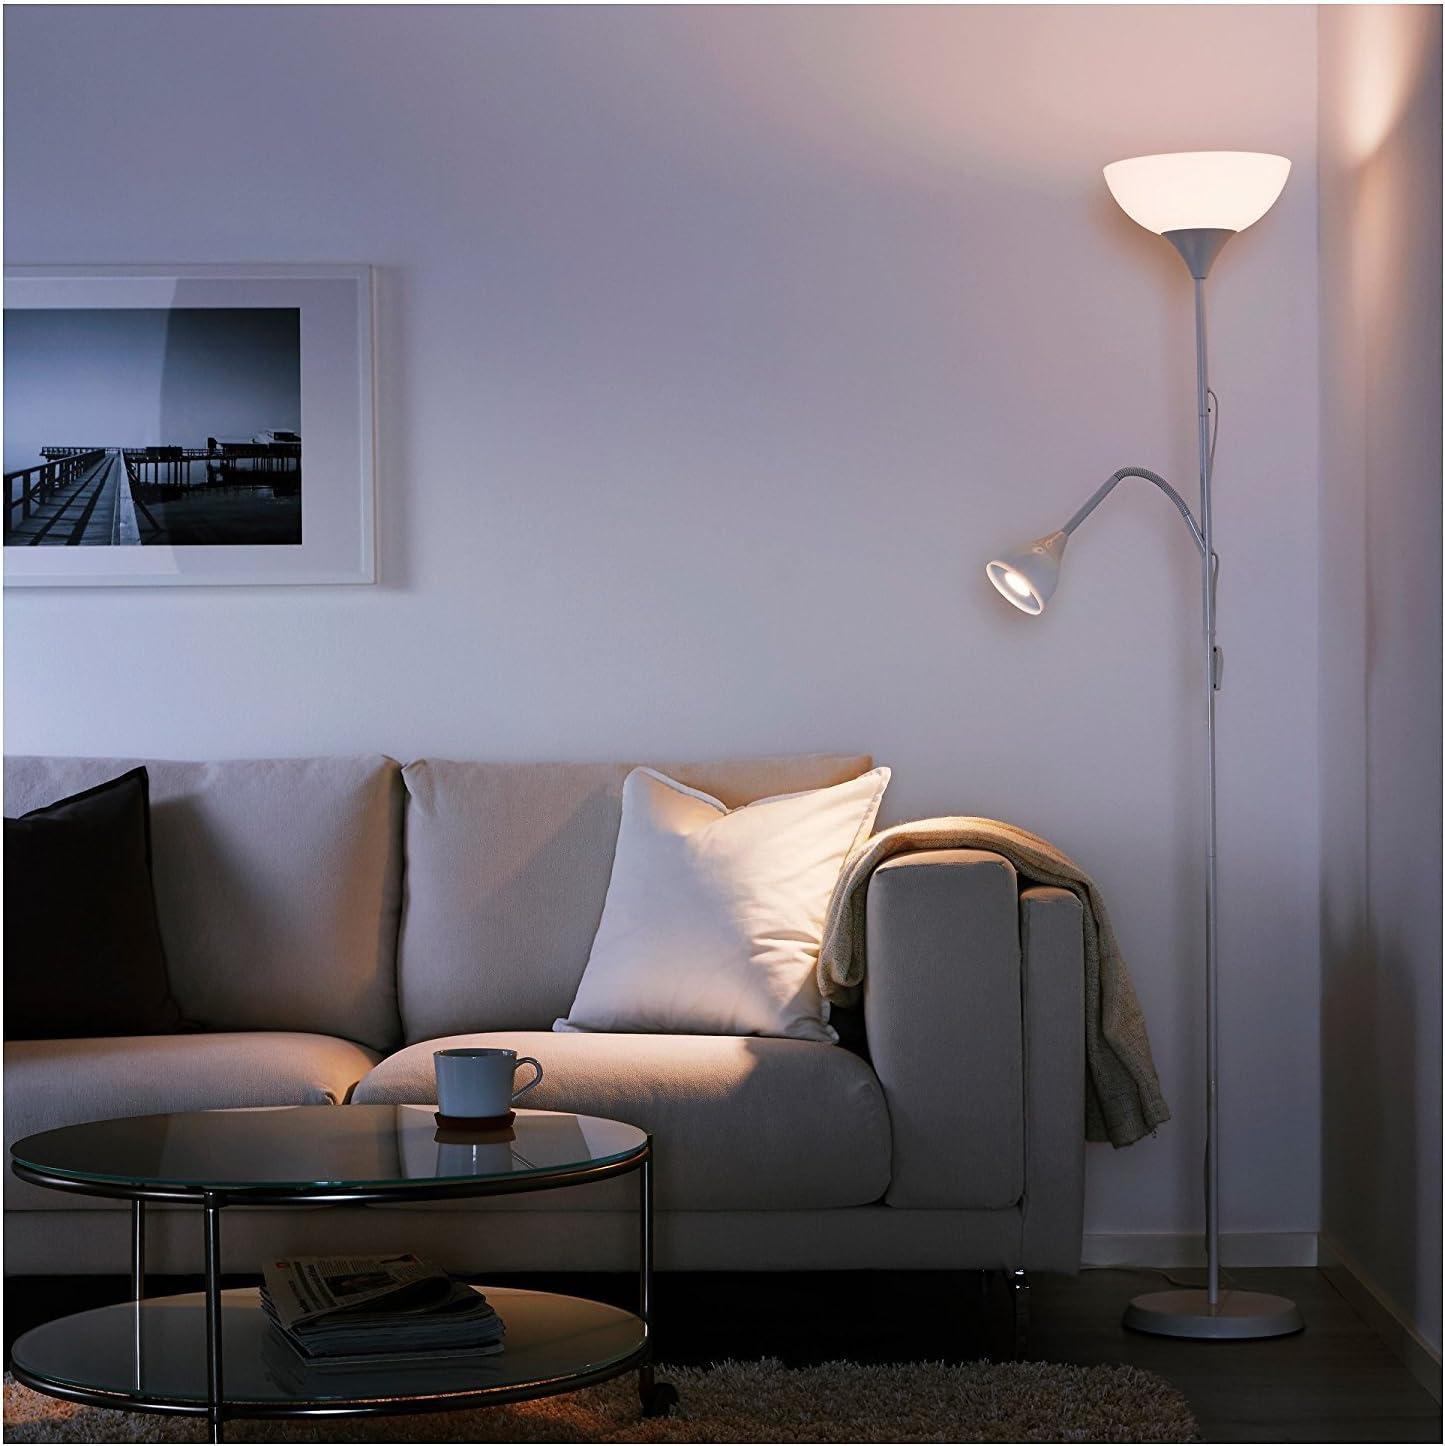 Ikea Uplighter Reading Lamp 175 Cmx 27cmx 28cm White Amazon Co Uk